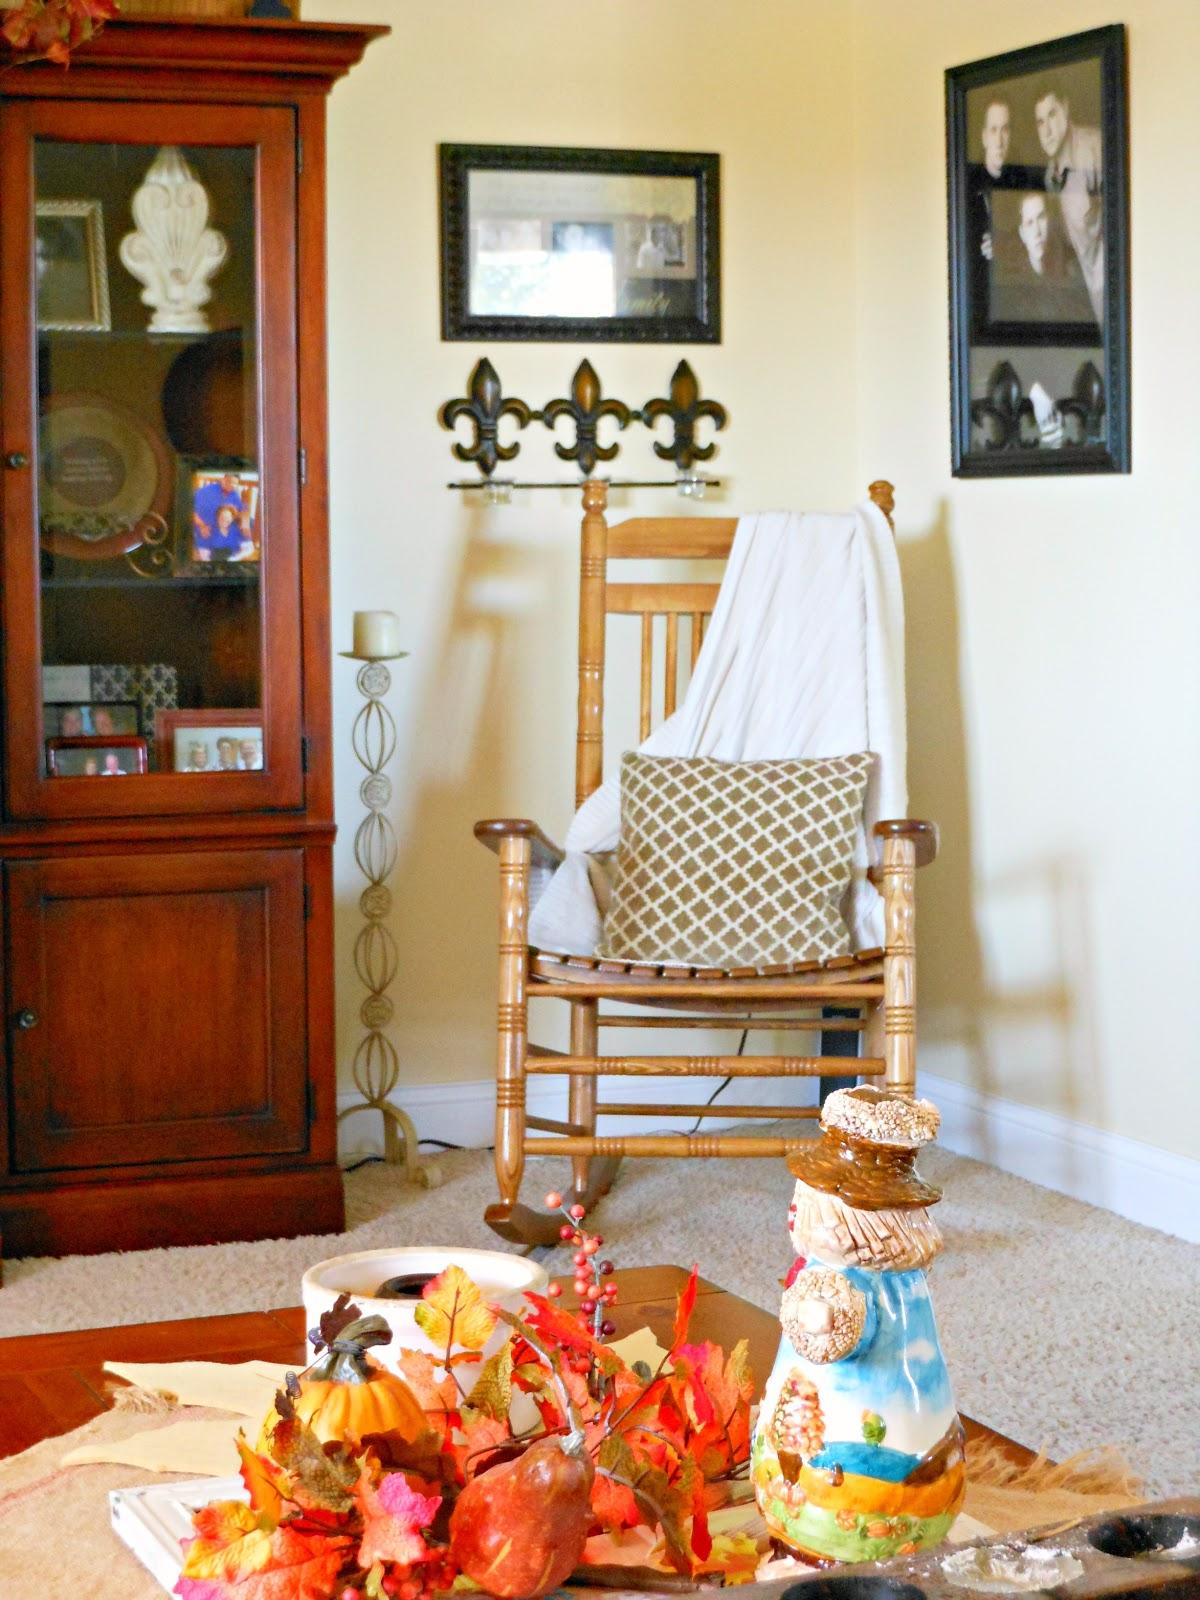 Autumn Living Room Decorating Ideas: If The Creek Don't Rise: Autumn Home Tour